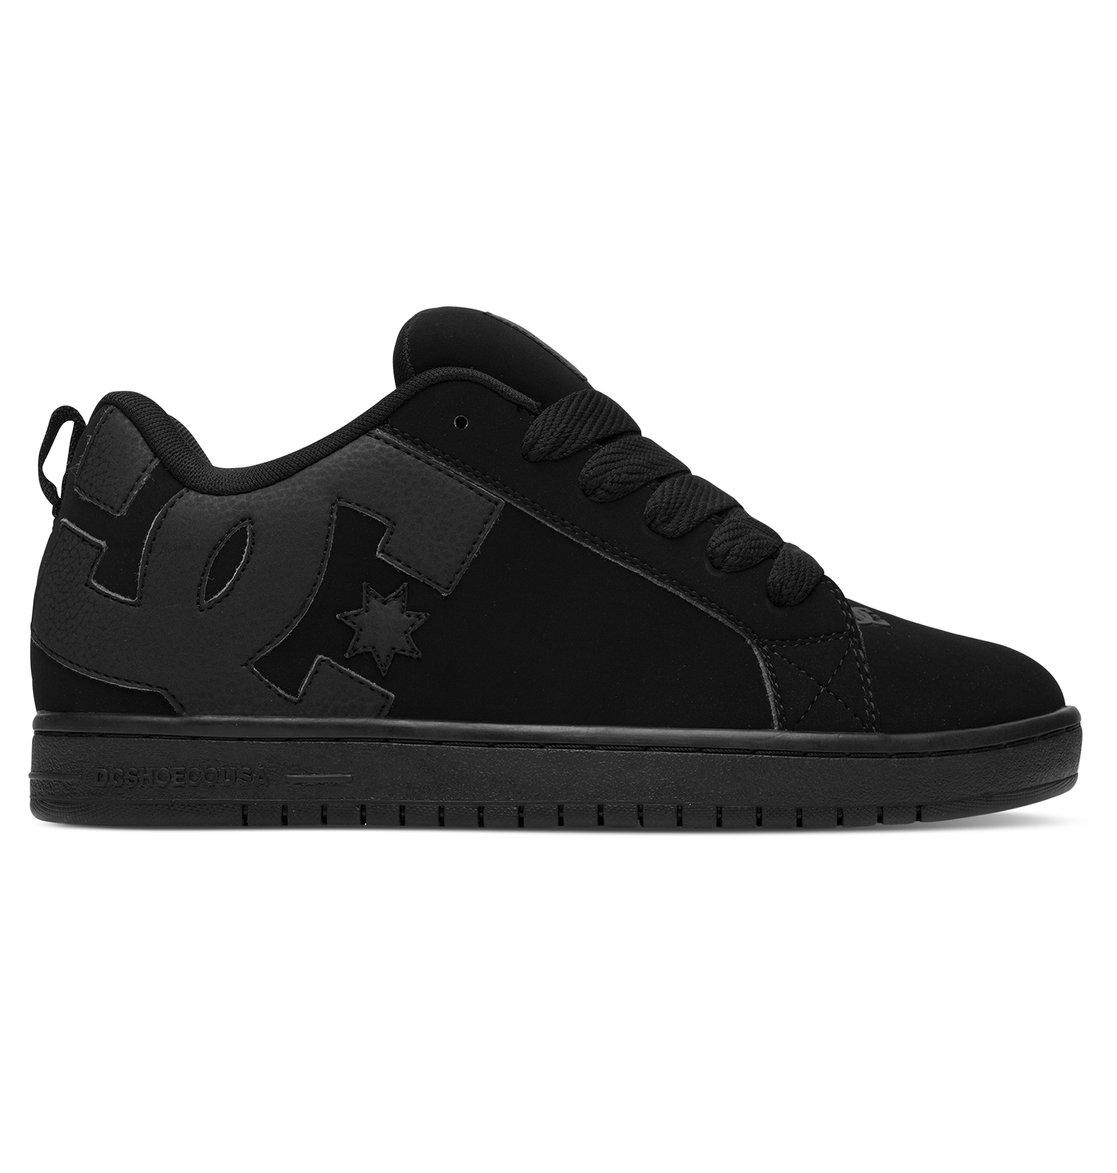 06cdba91caf70 Court Graffik - Shoes